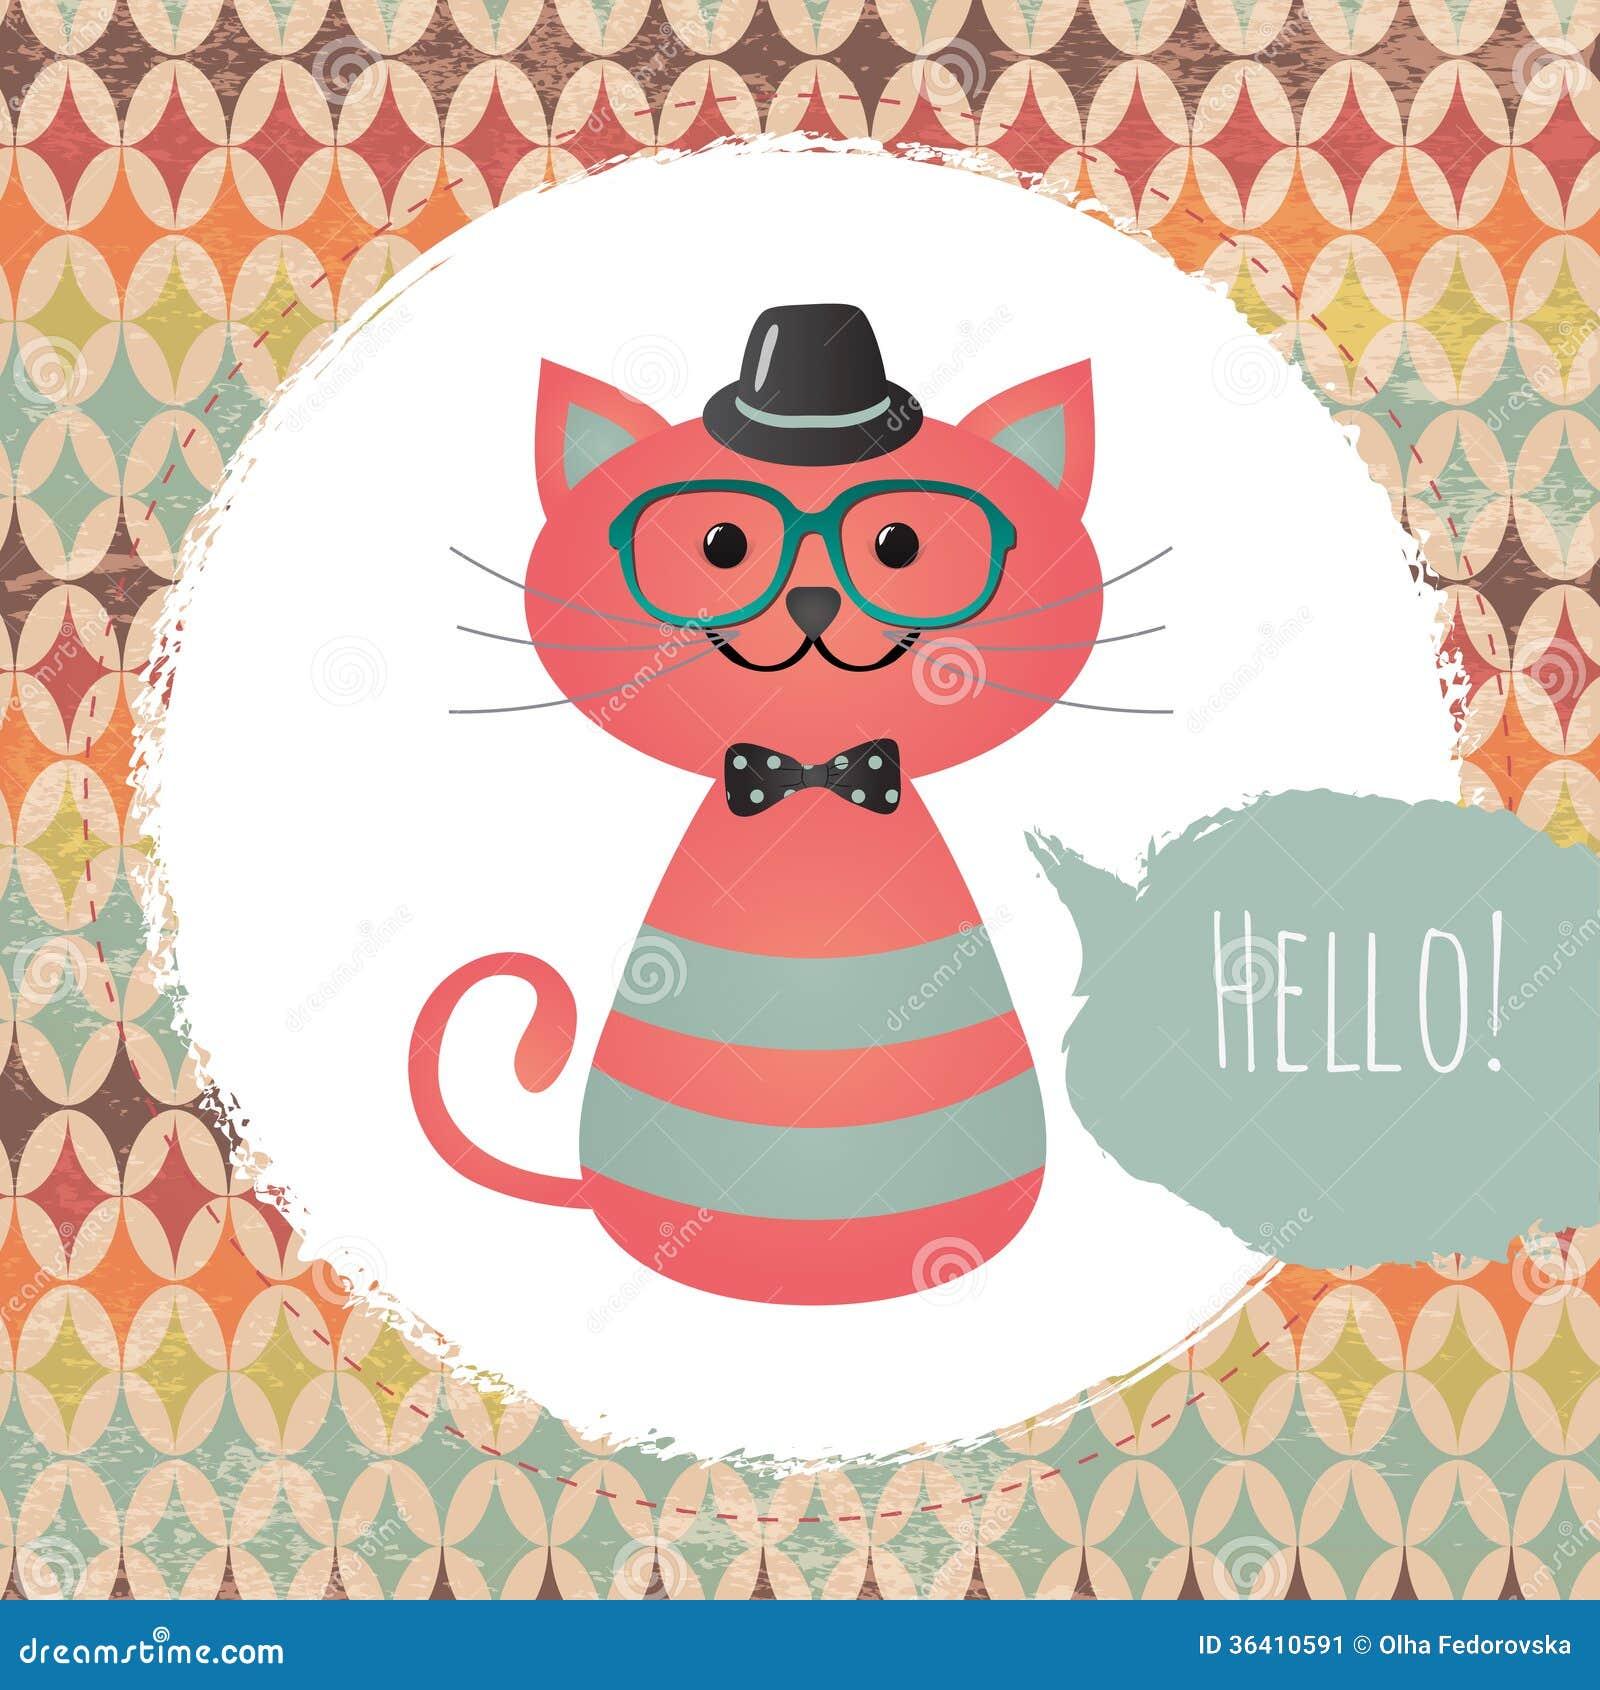 Owl Party Invitation is beautiful invitation layout